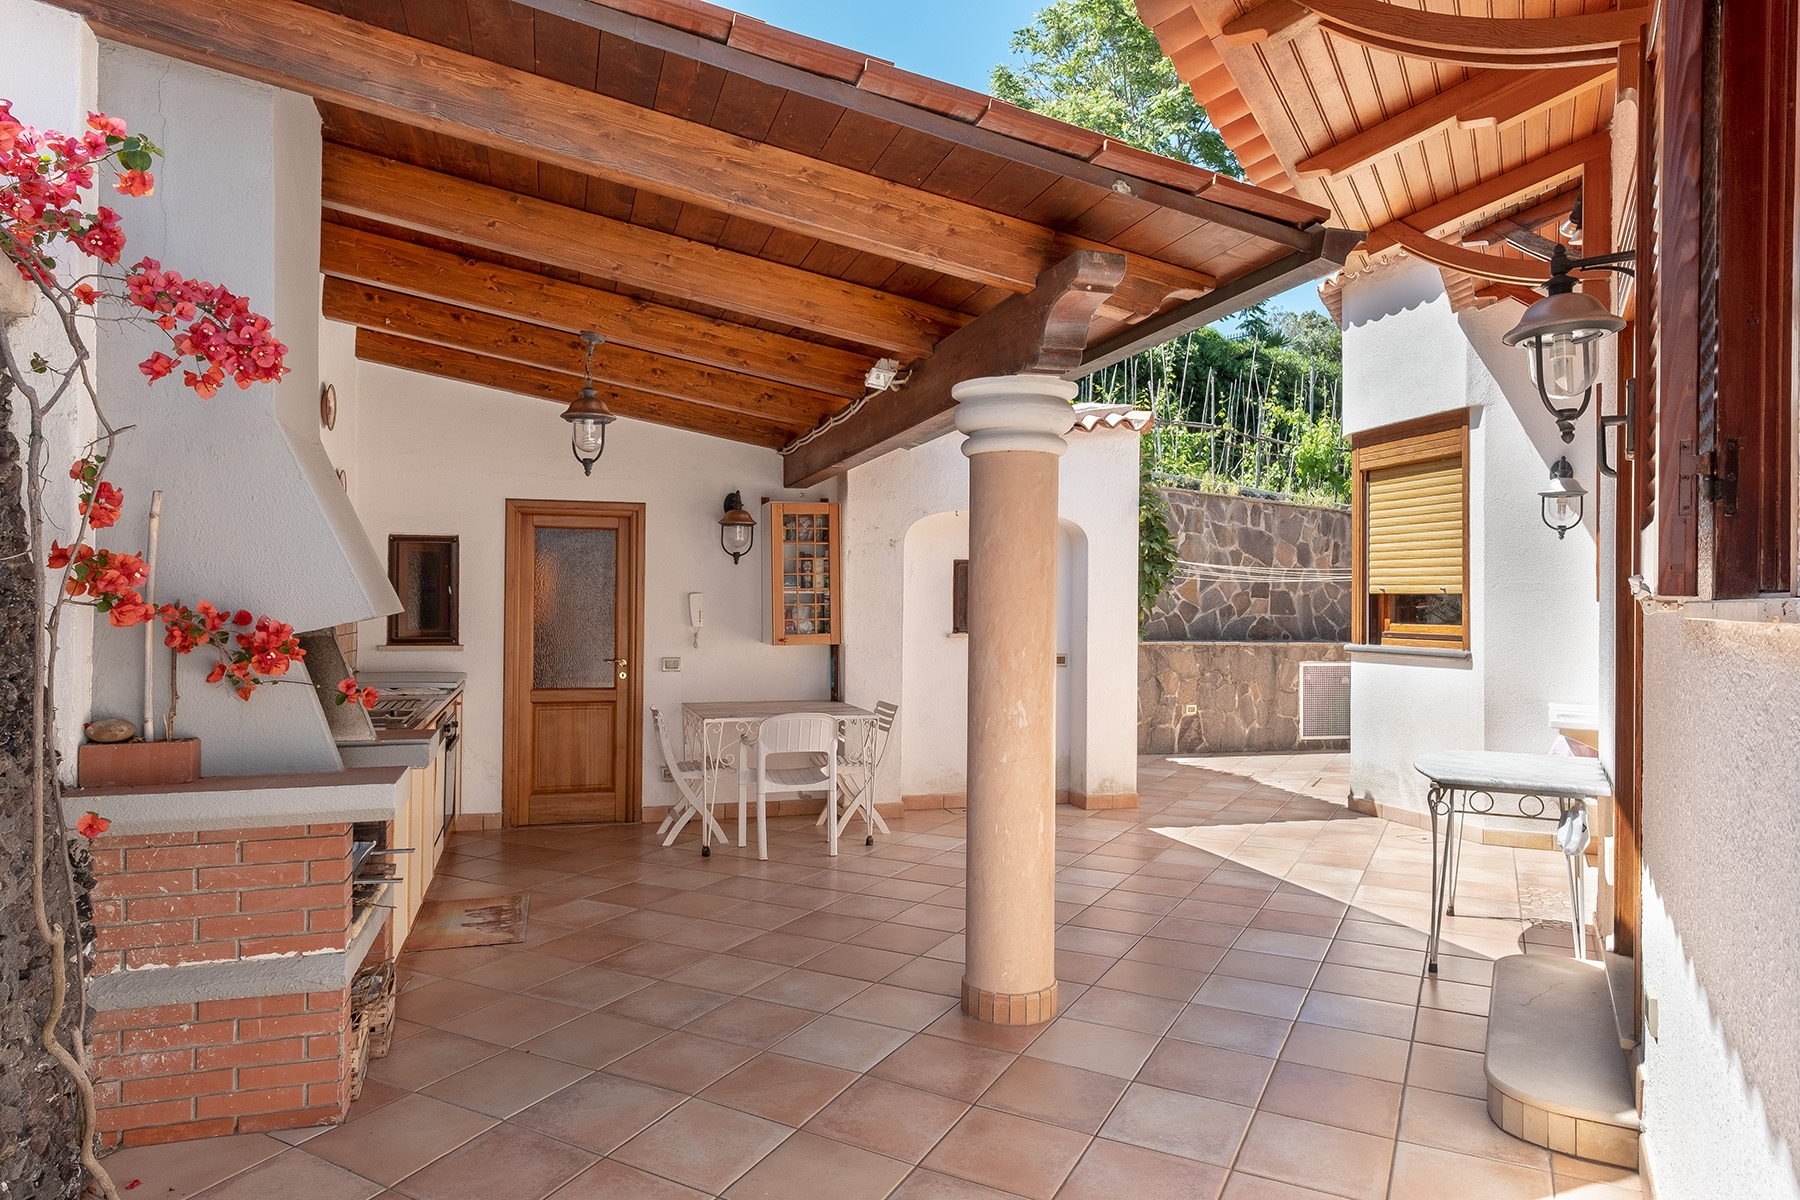 Villa in Vendita a Ischia: 5 locali, 138 mq - Foto 14